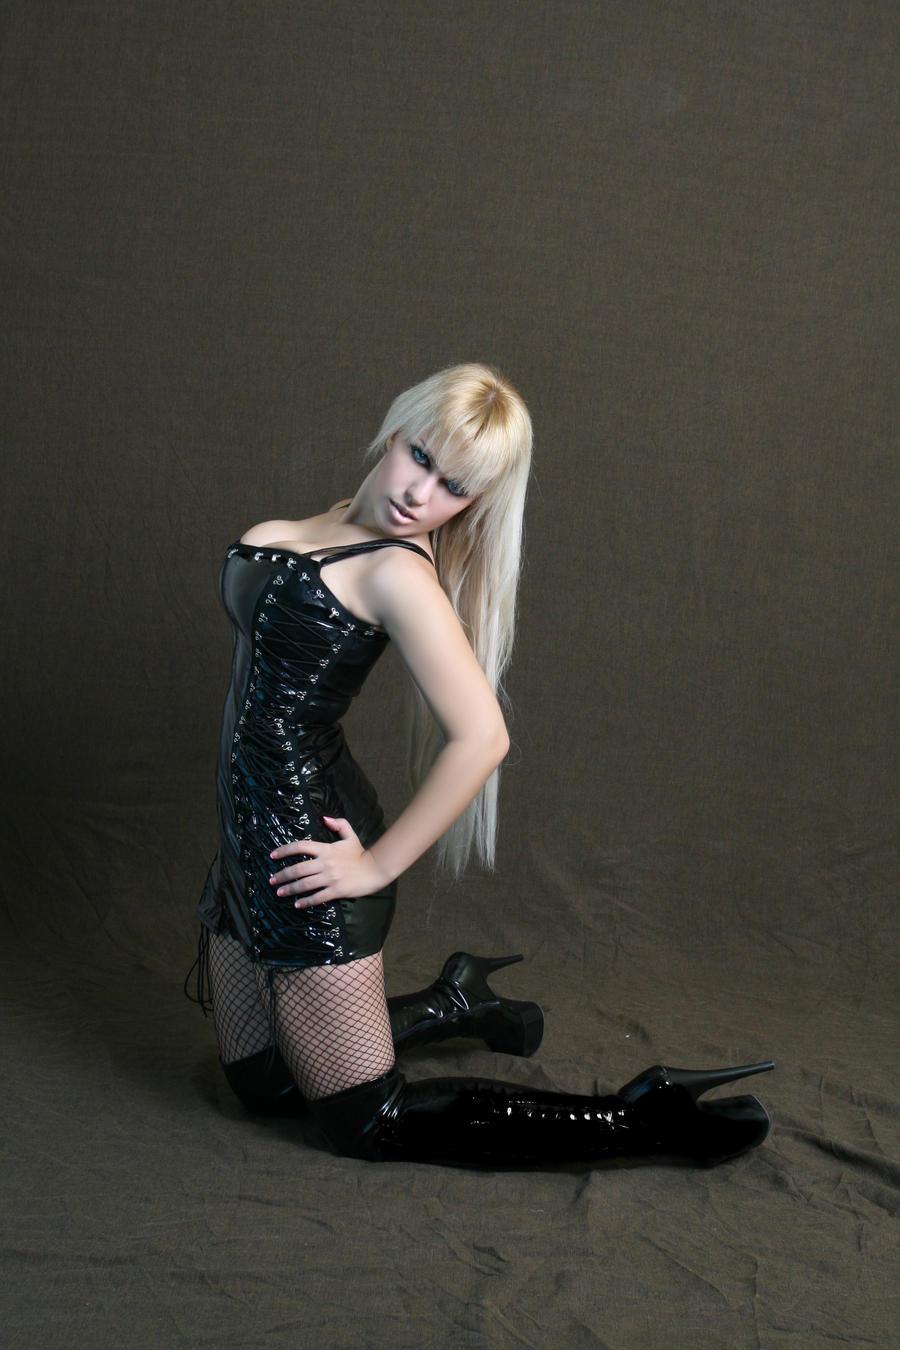 http://fc01.deviantart.net/fs51/i/2009/315/b/4/Black_Vinyl_High_Heels_Stock_by_tanit_isis_stock.jpg